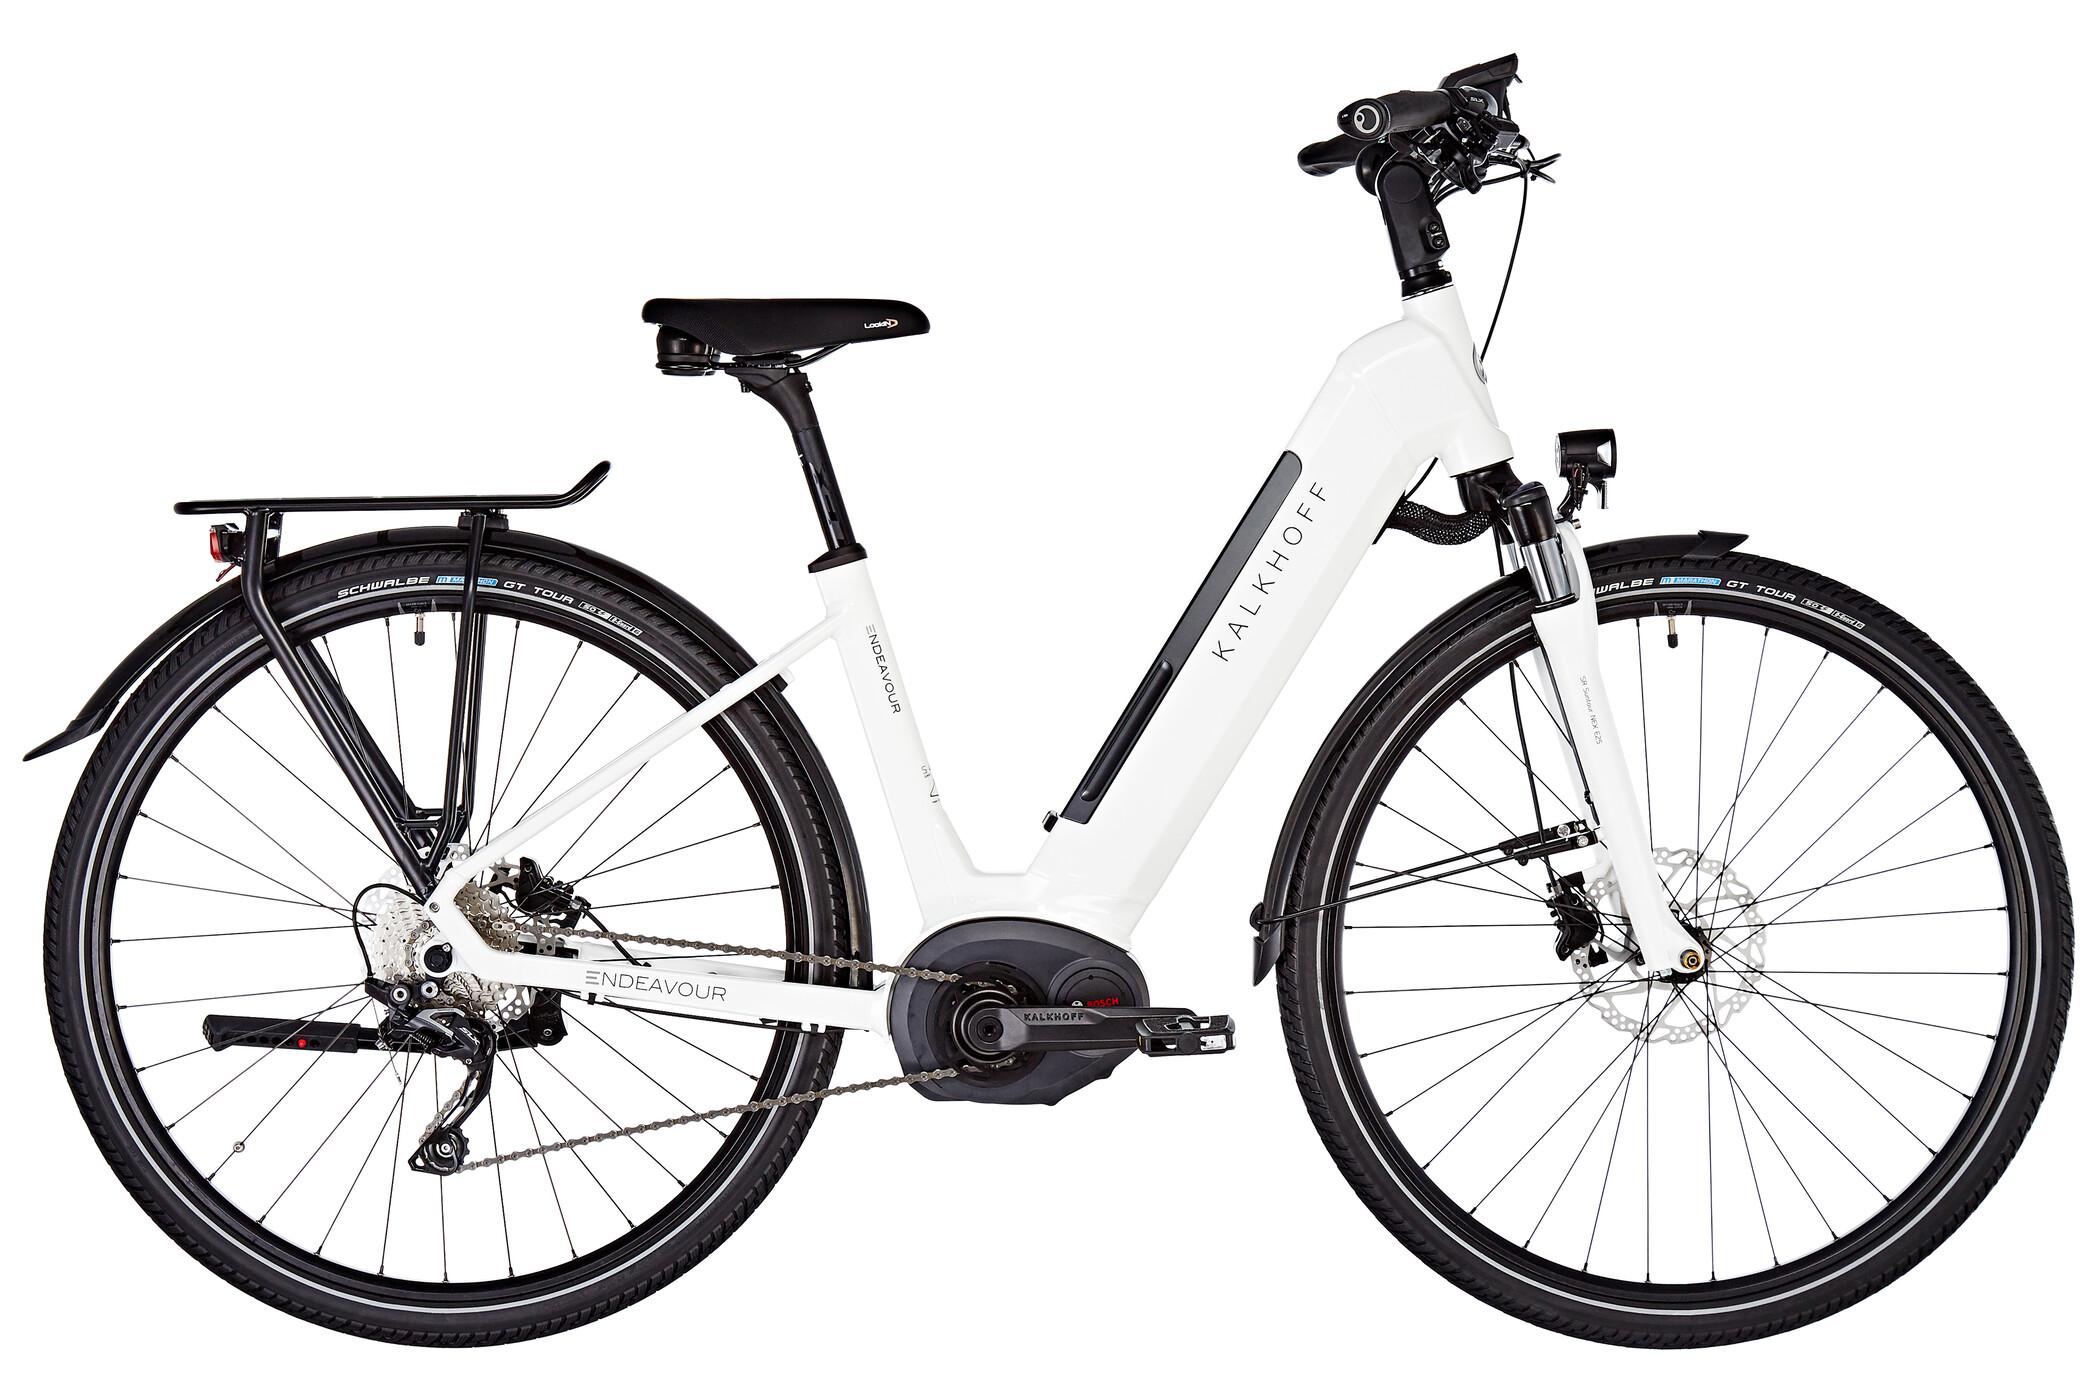 "Kalkhoff Endeavour Advance B10 E-trekkingcykel Wave 28"" 500Wh hvid (2019) | City-cykler"